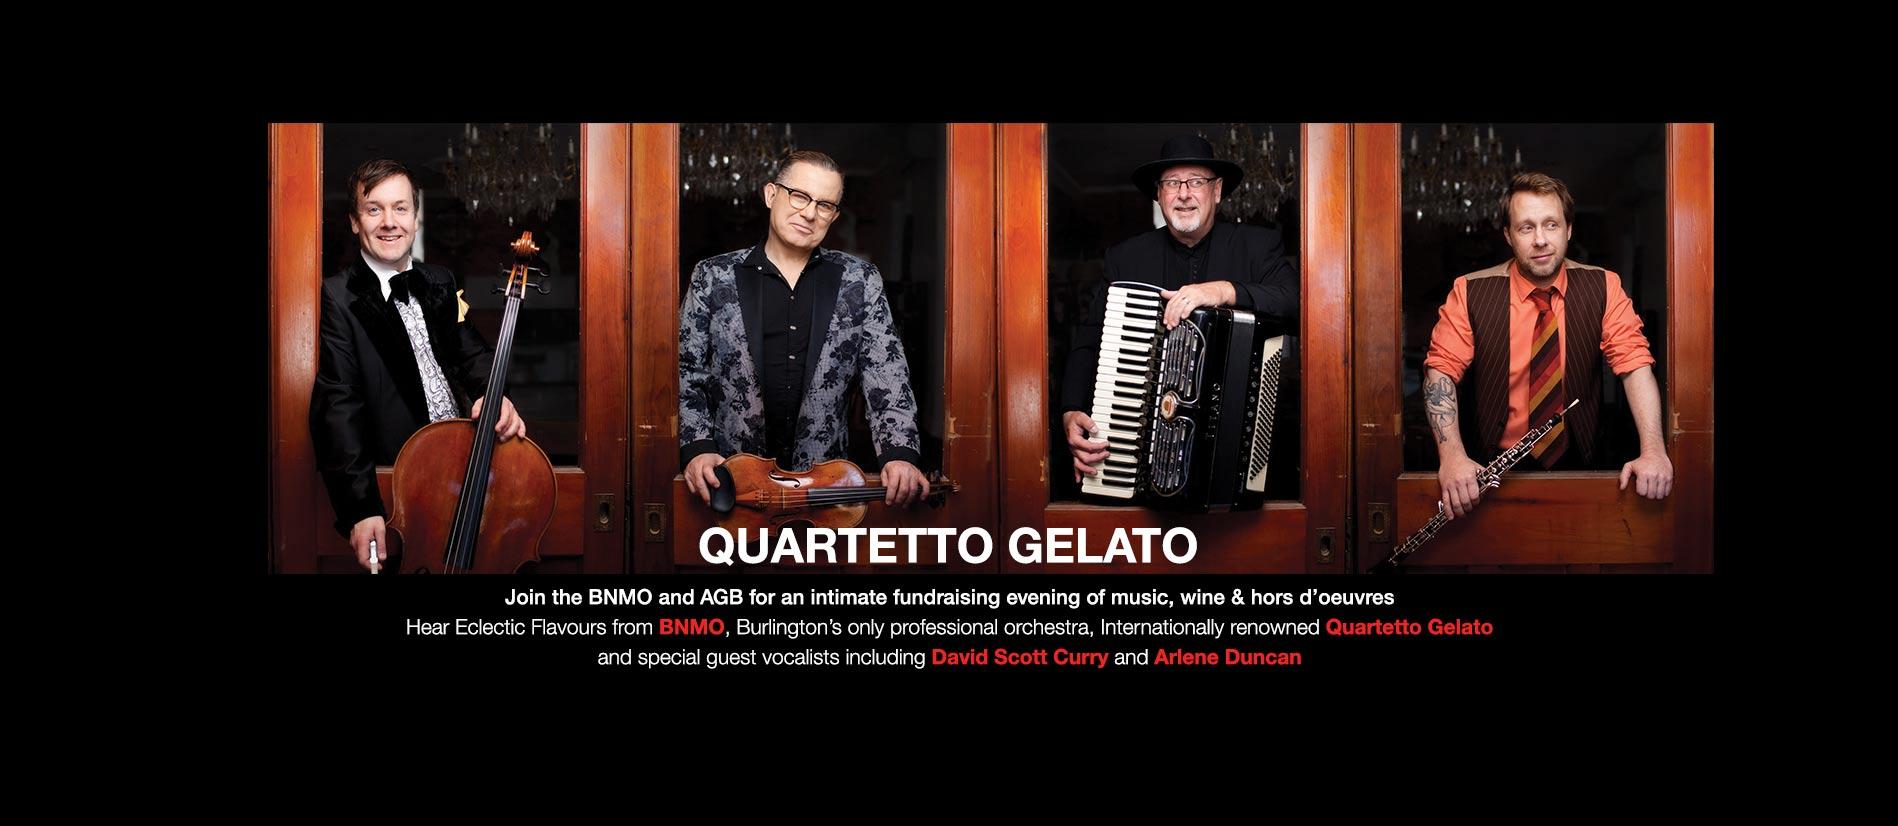 Internationally renowned Quartetto Gelato